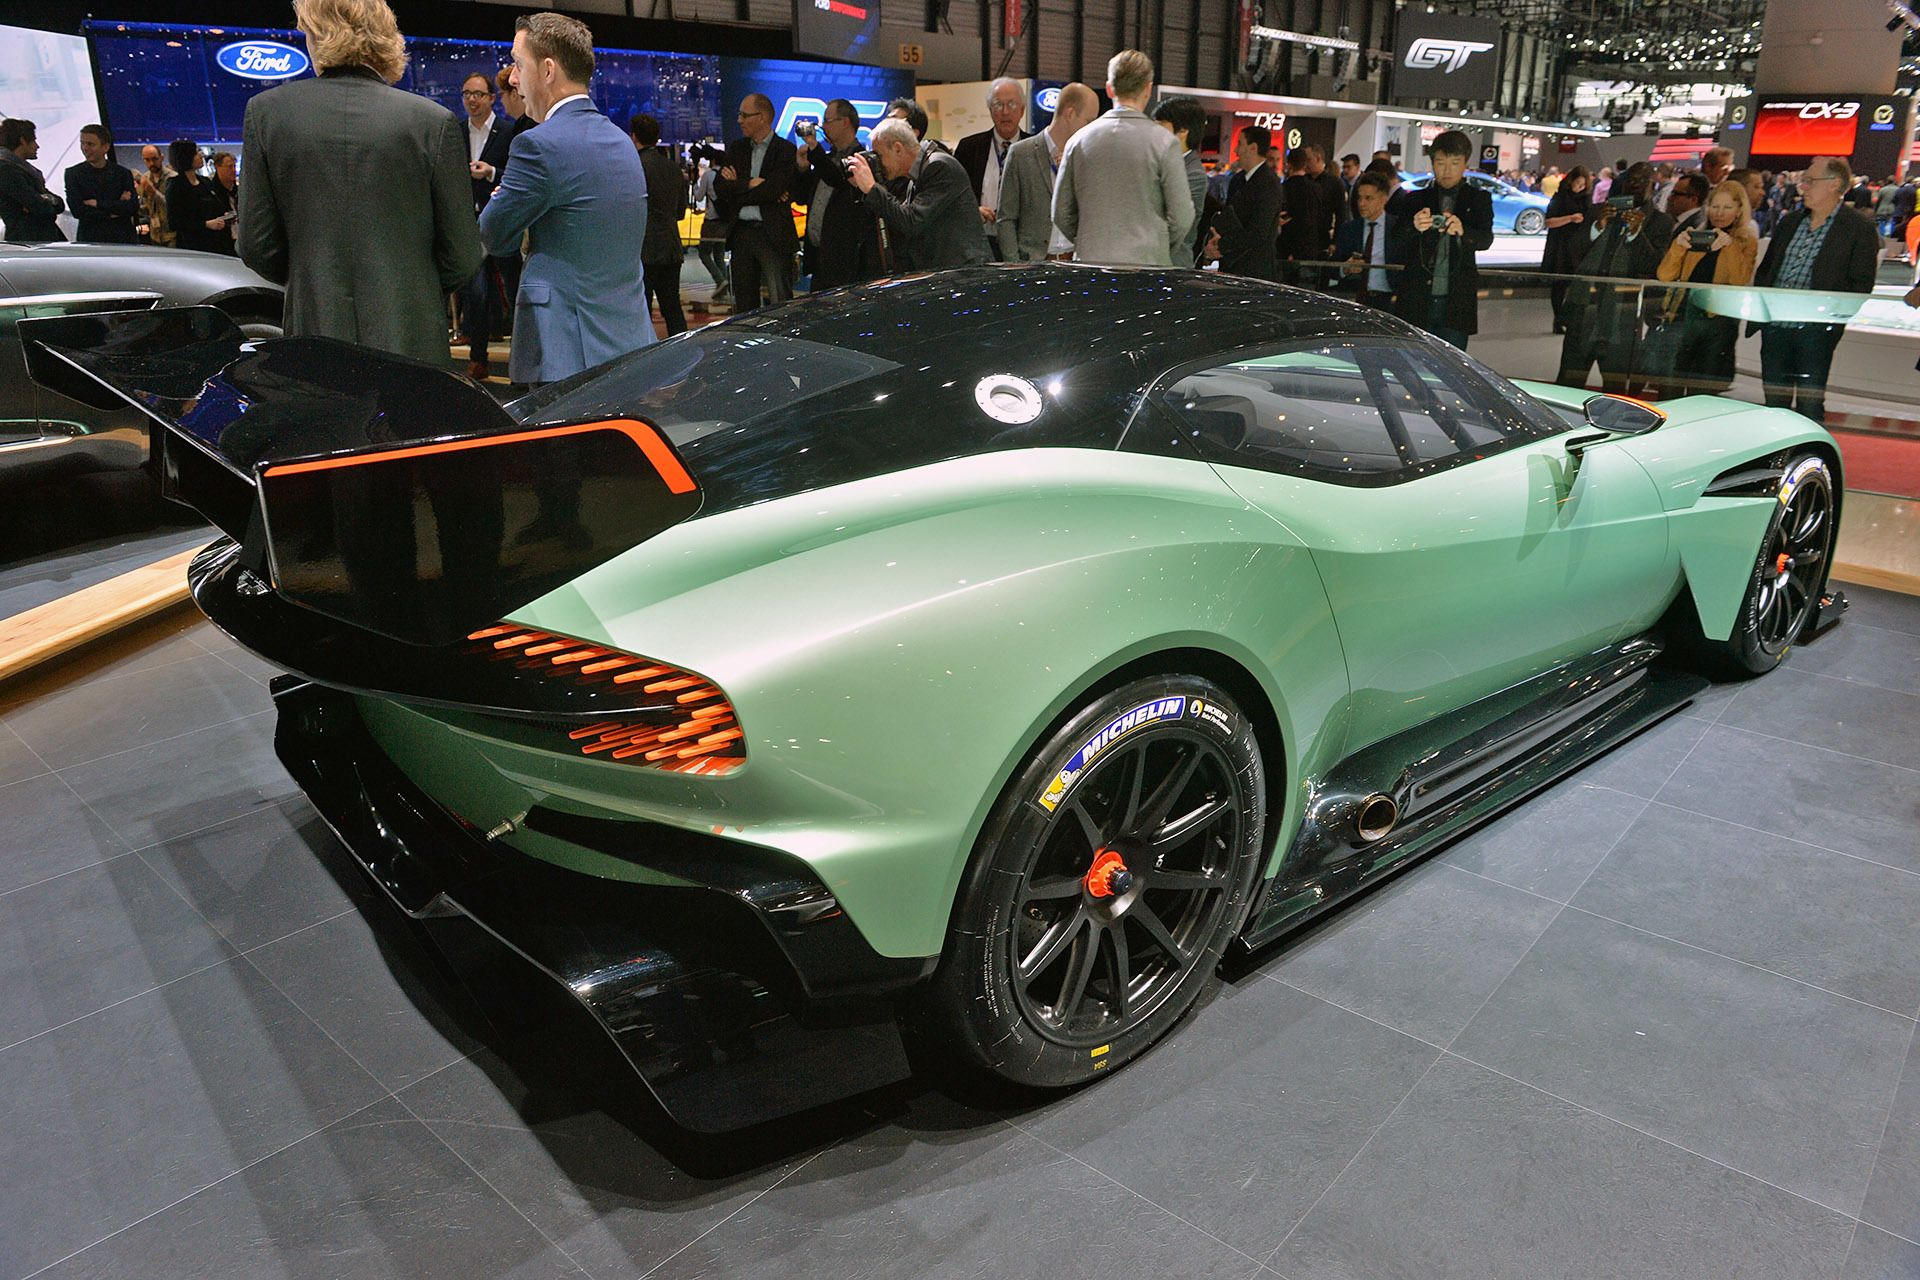 800 Hp Aston Martin Vulcan Will Live Long And Prosper On The Track Aston Martin Aston Martin Vulcan Super Sport Cars